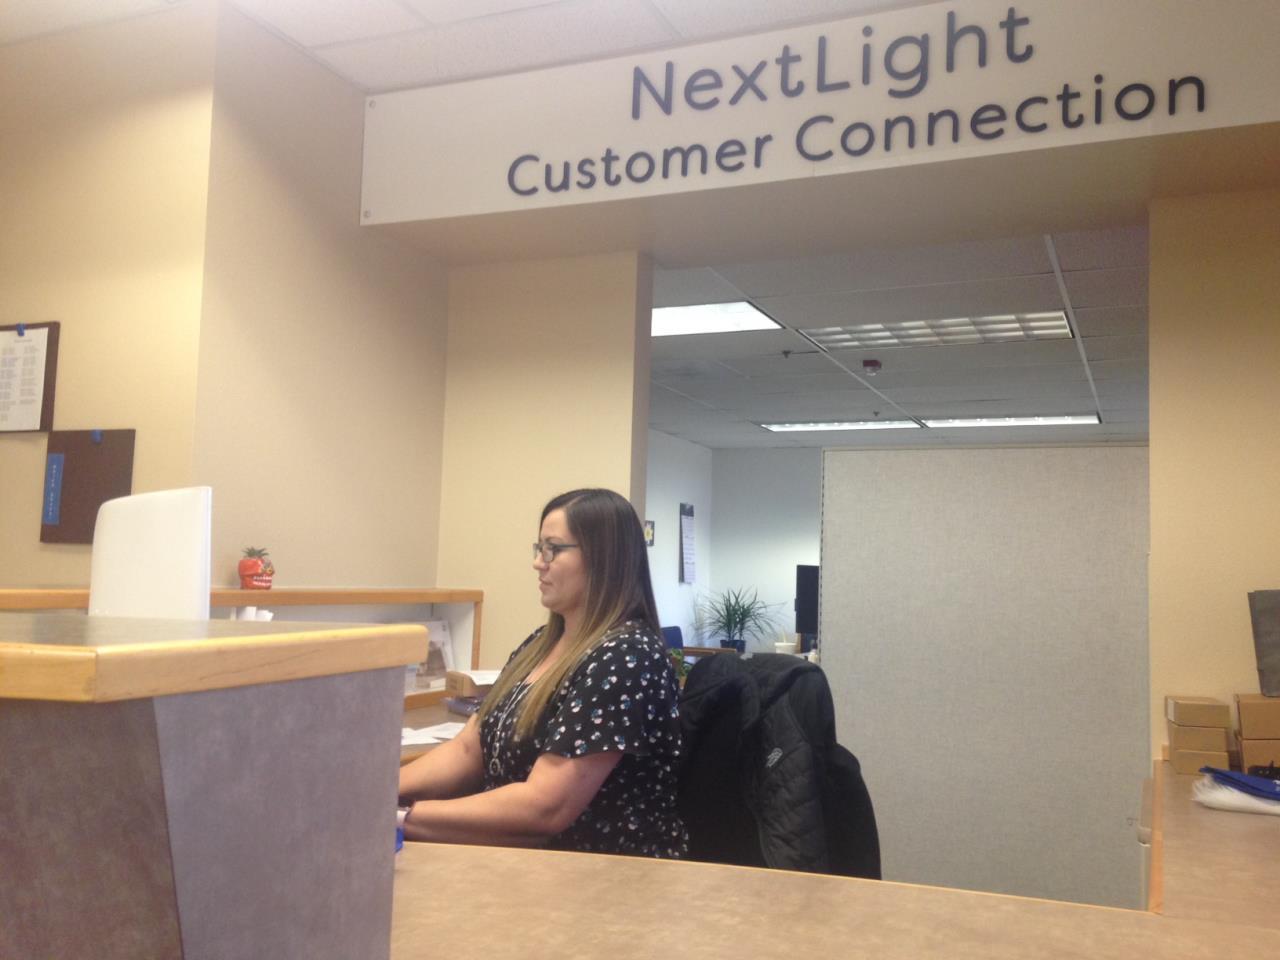 NextLight Customer Connection Desk